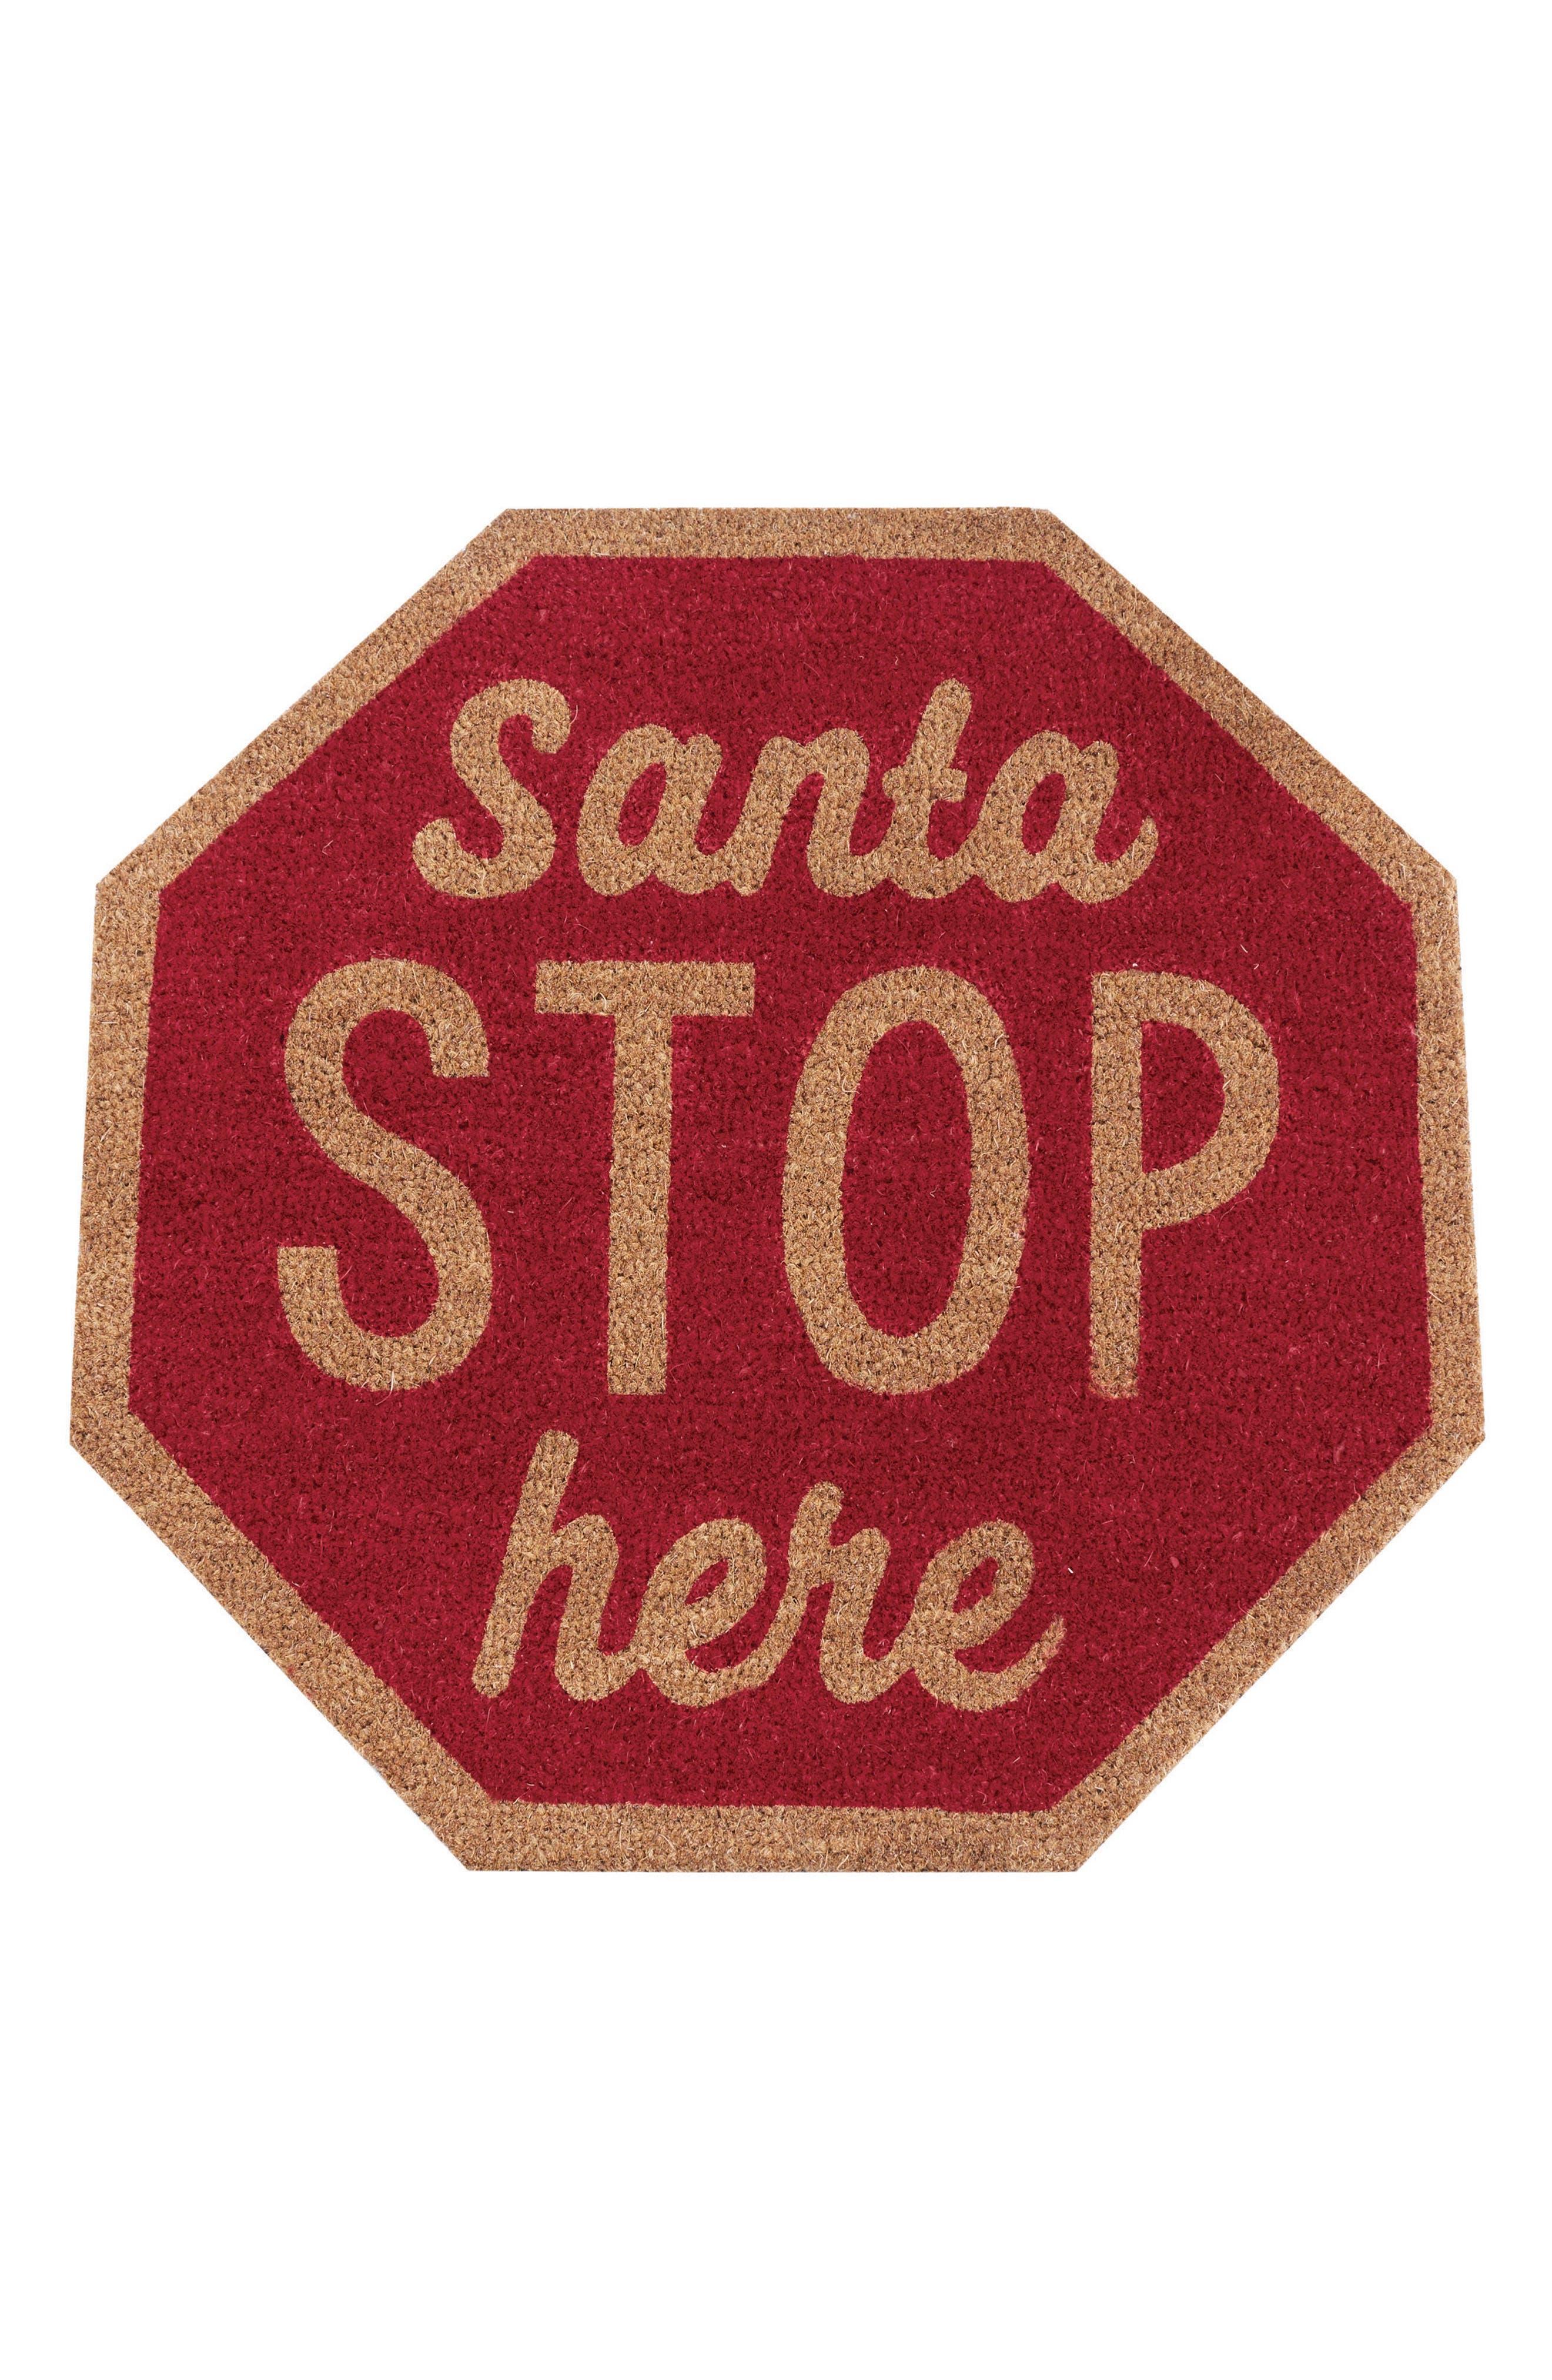 Santa Stop Here Coir Door Mat,                         Main,                         color, Red